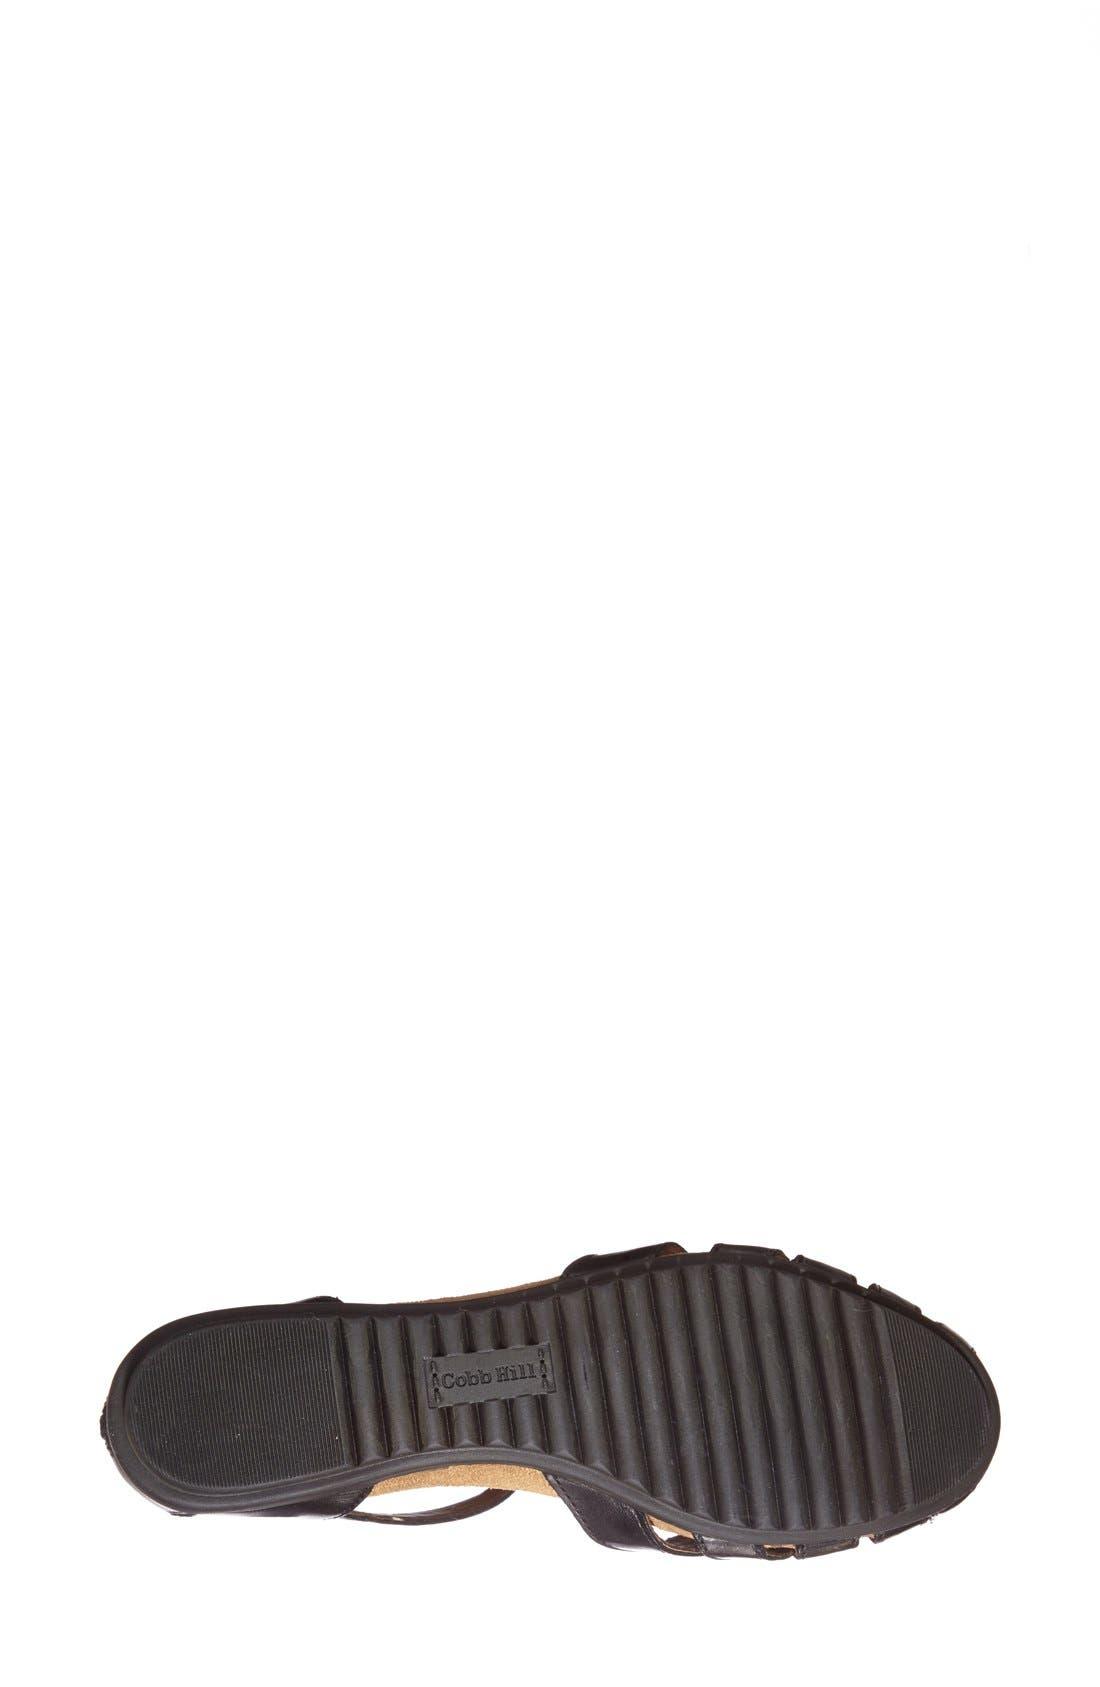 ROCKPORT COBB HILL, 'Ireland' Leather Sandal, Alternate thumbnail 2, color, BLACK